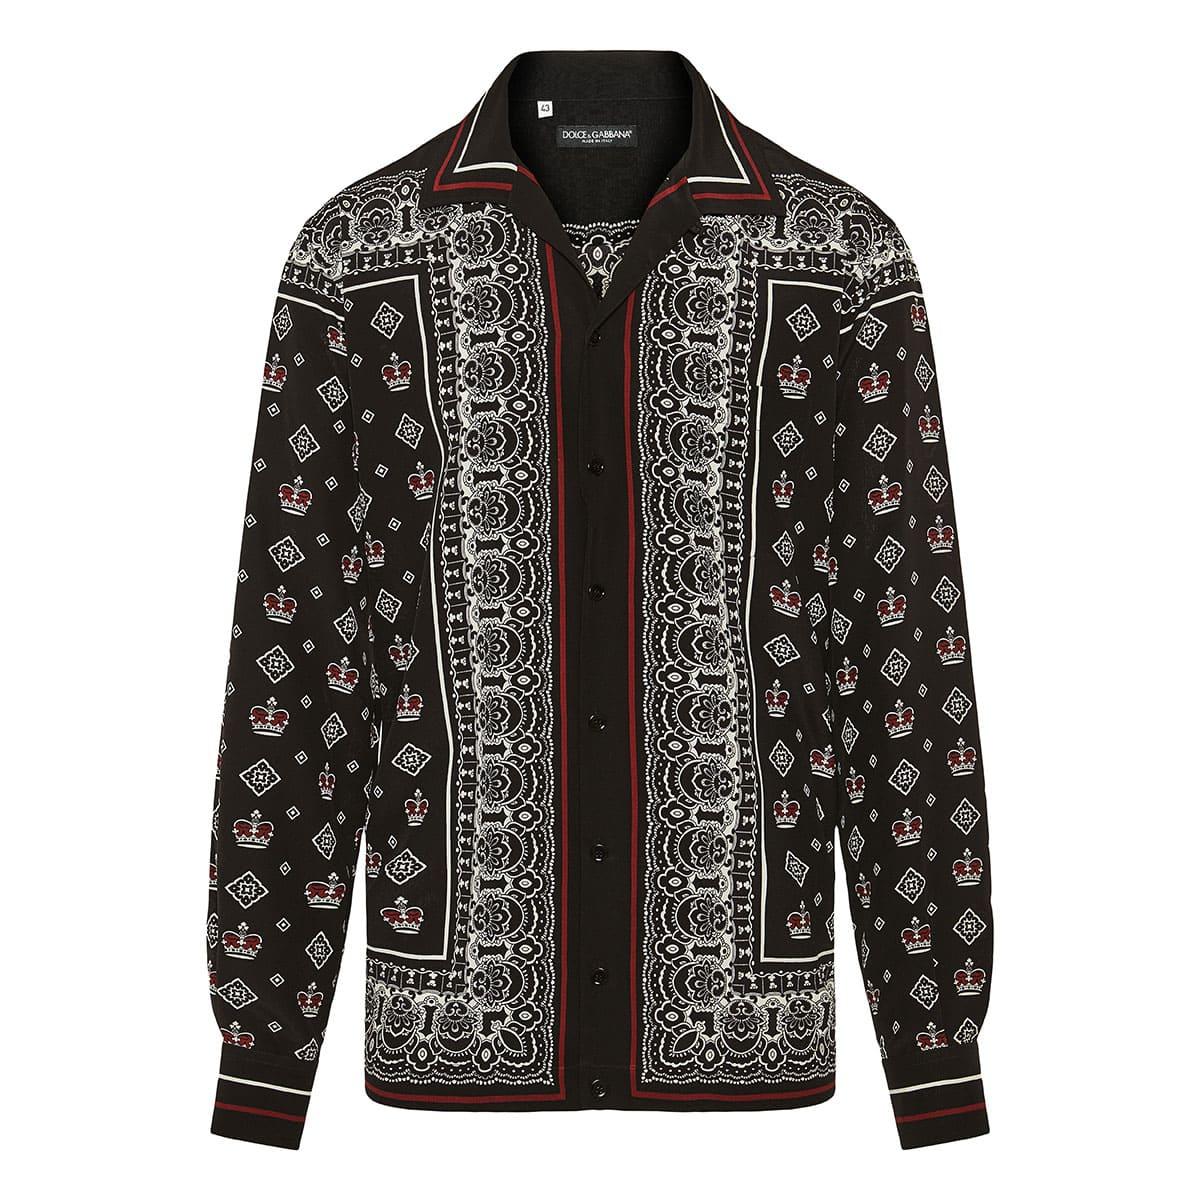 Bandana and Crown printed silk shirt